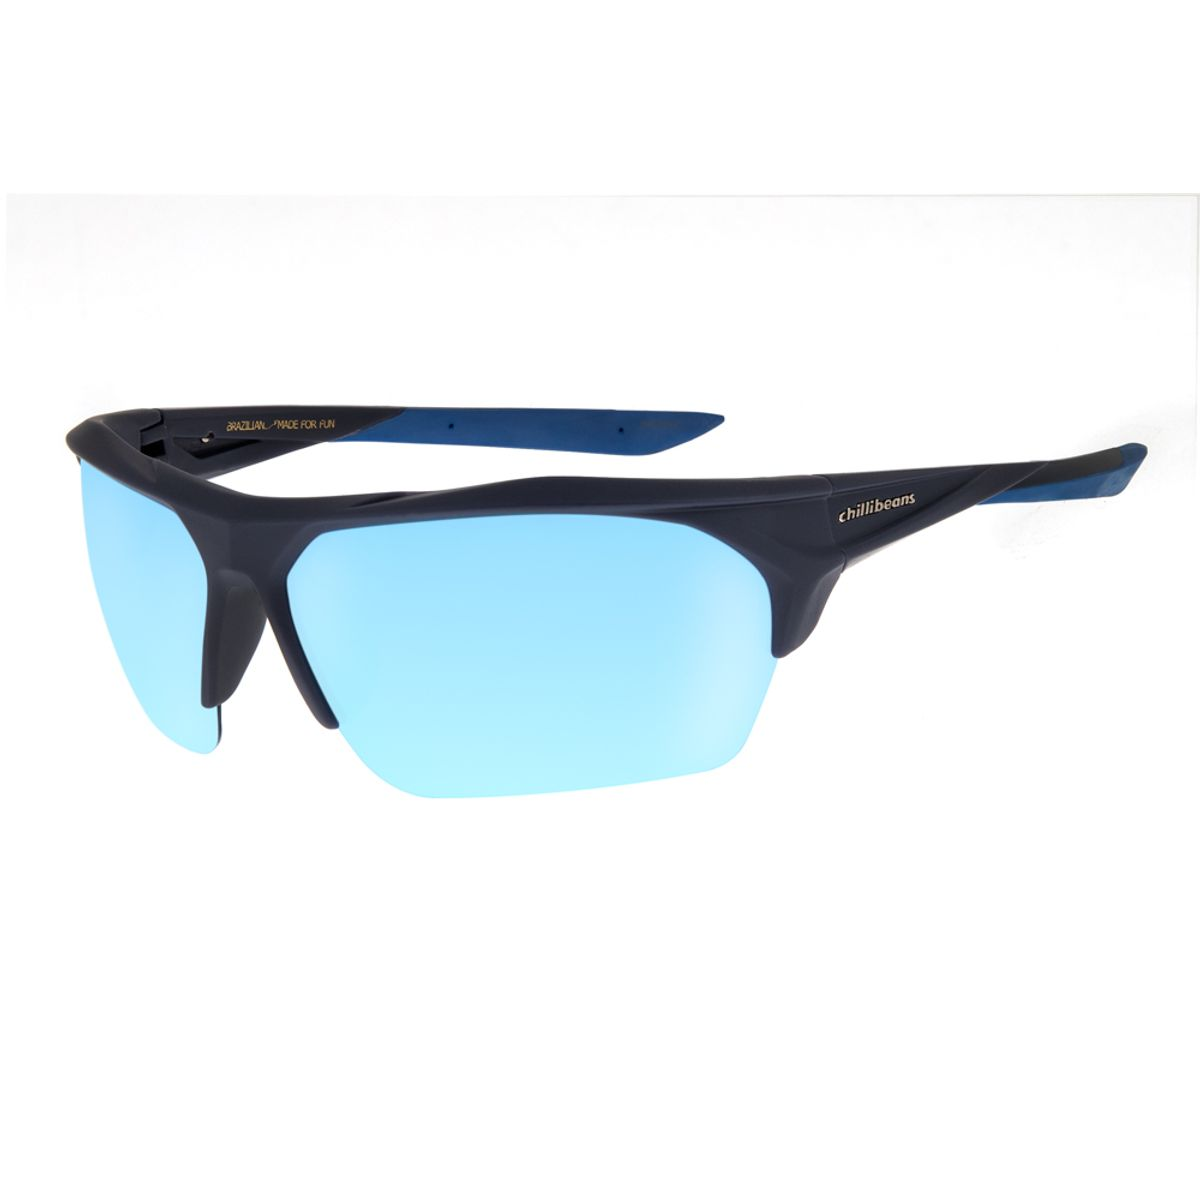 a36abc221 Óculos De Sol Chilli Beans Masculino Esporte Azul Espelhado ...